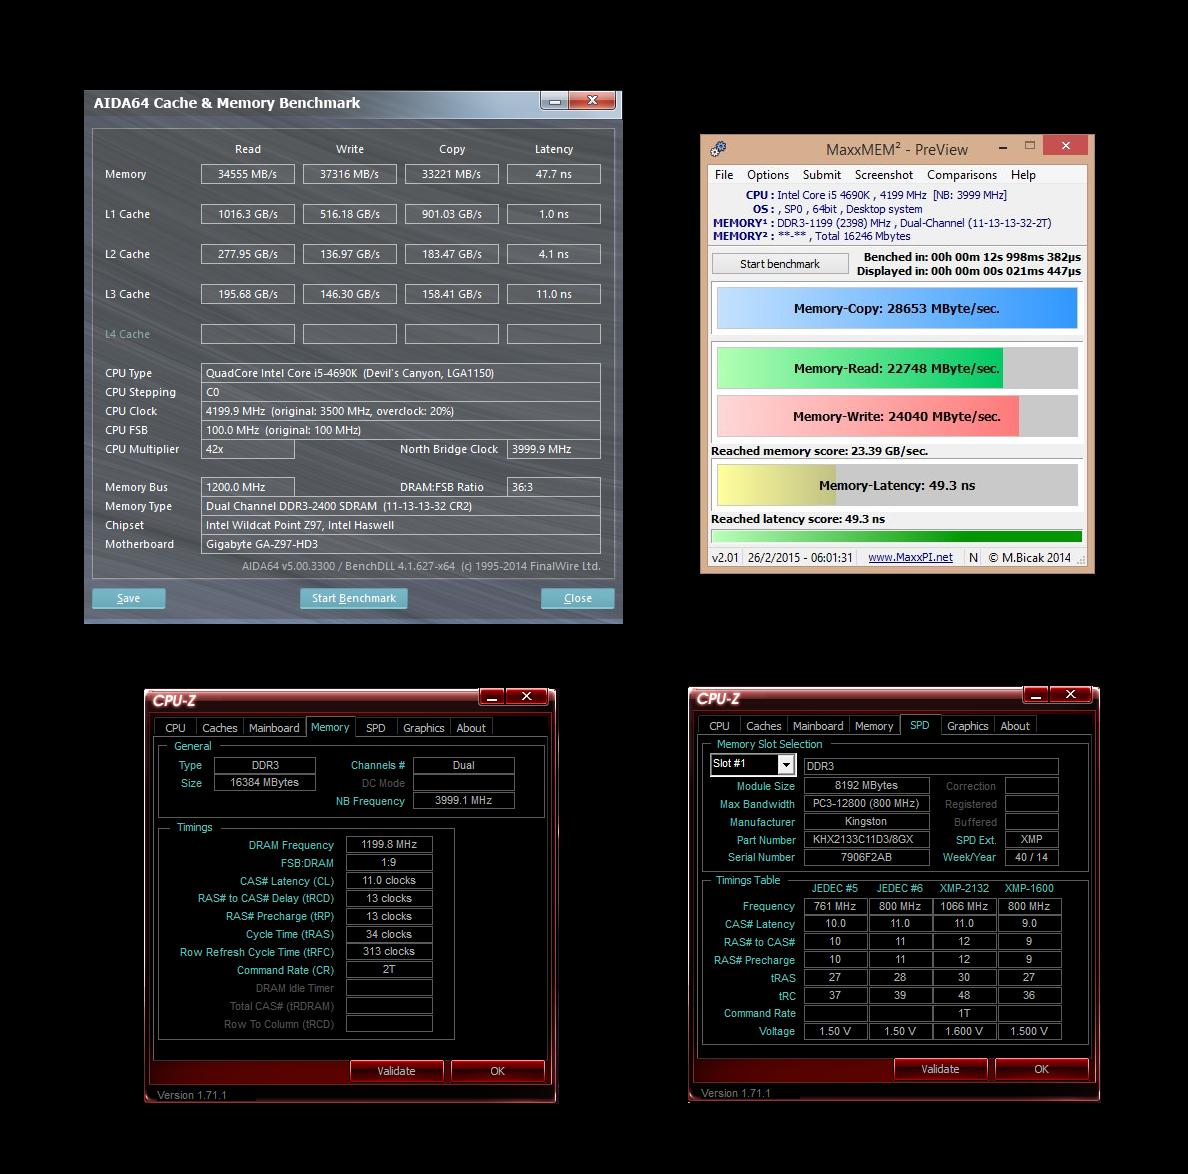 Kingston HyperX Savage DDR3 16GB 2133MHz RAM Review - Dragon Blogger